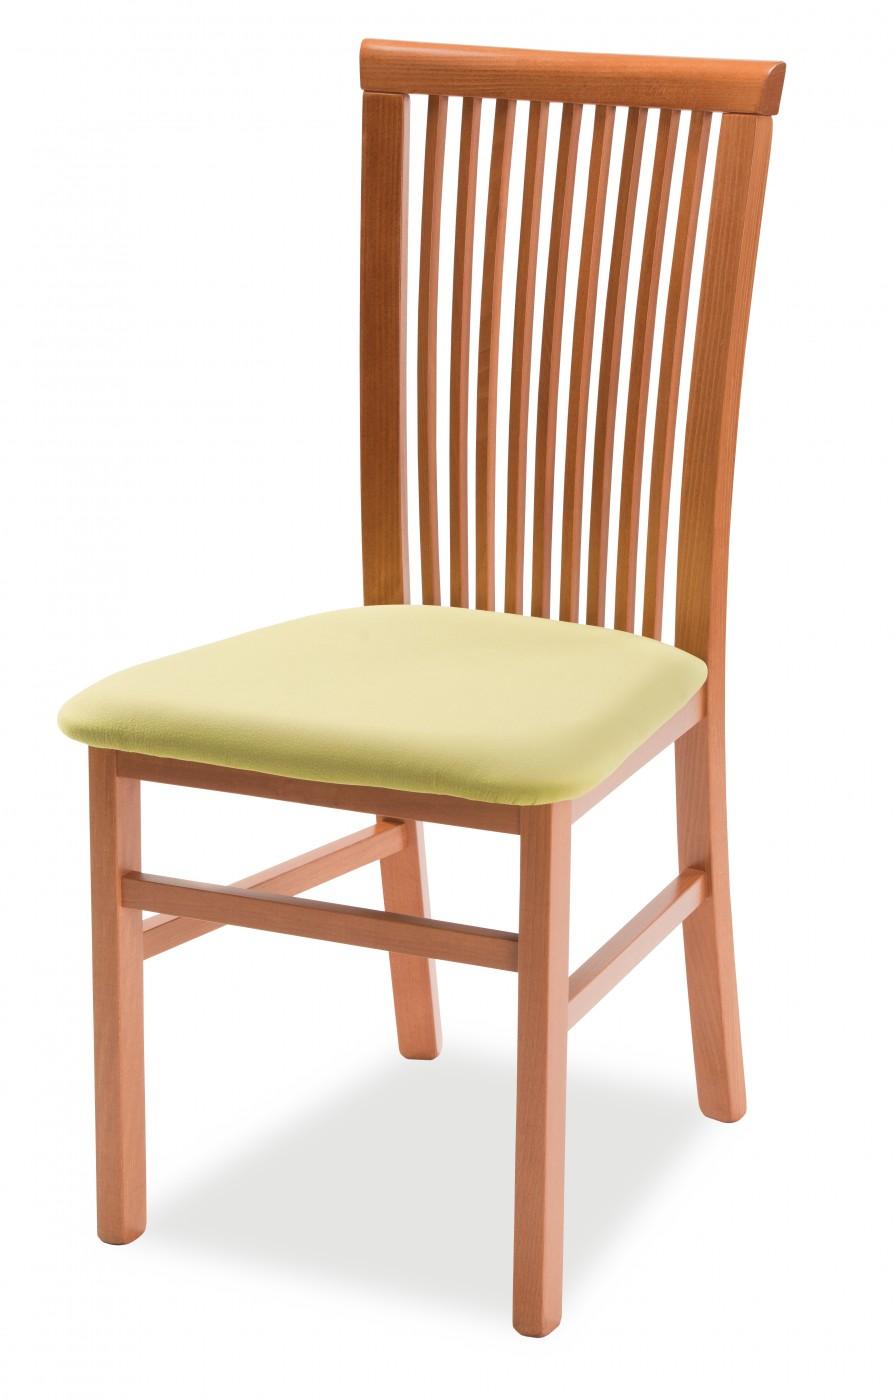 Kuchyňská židle ANGELO 1 II.sk